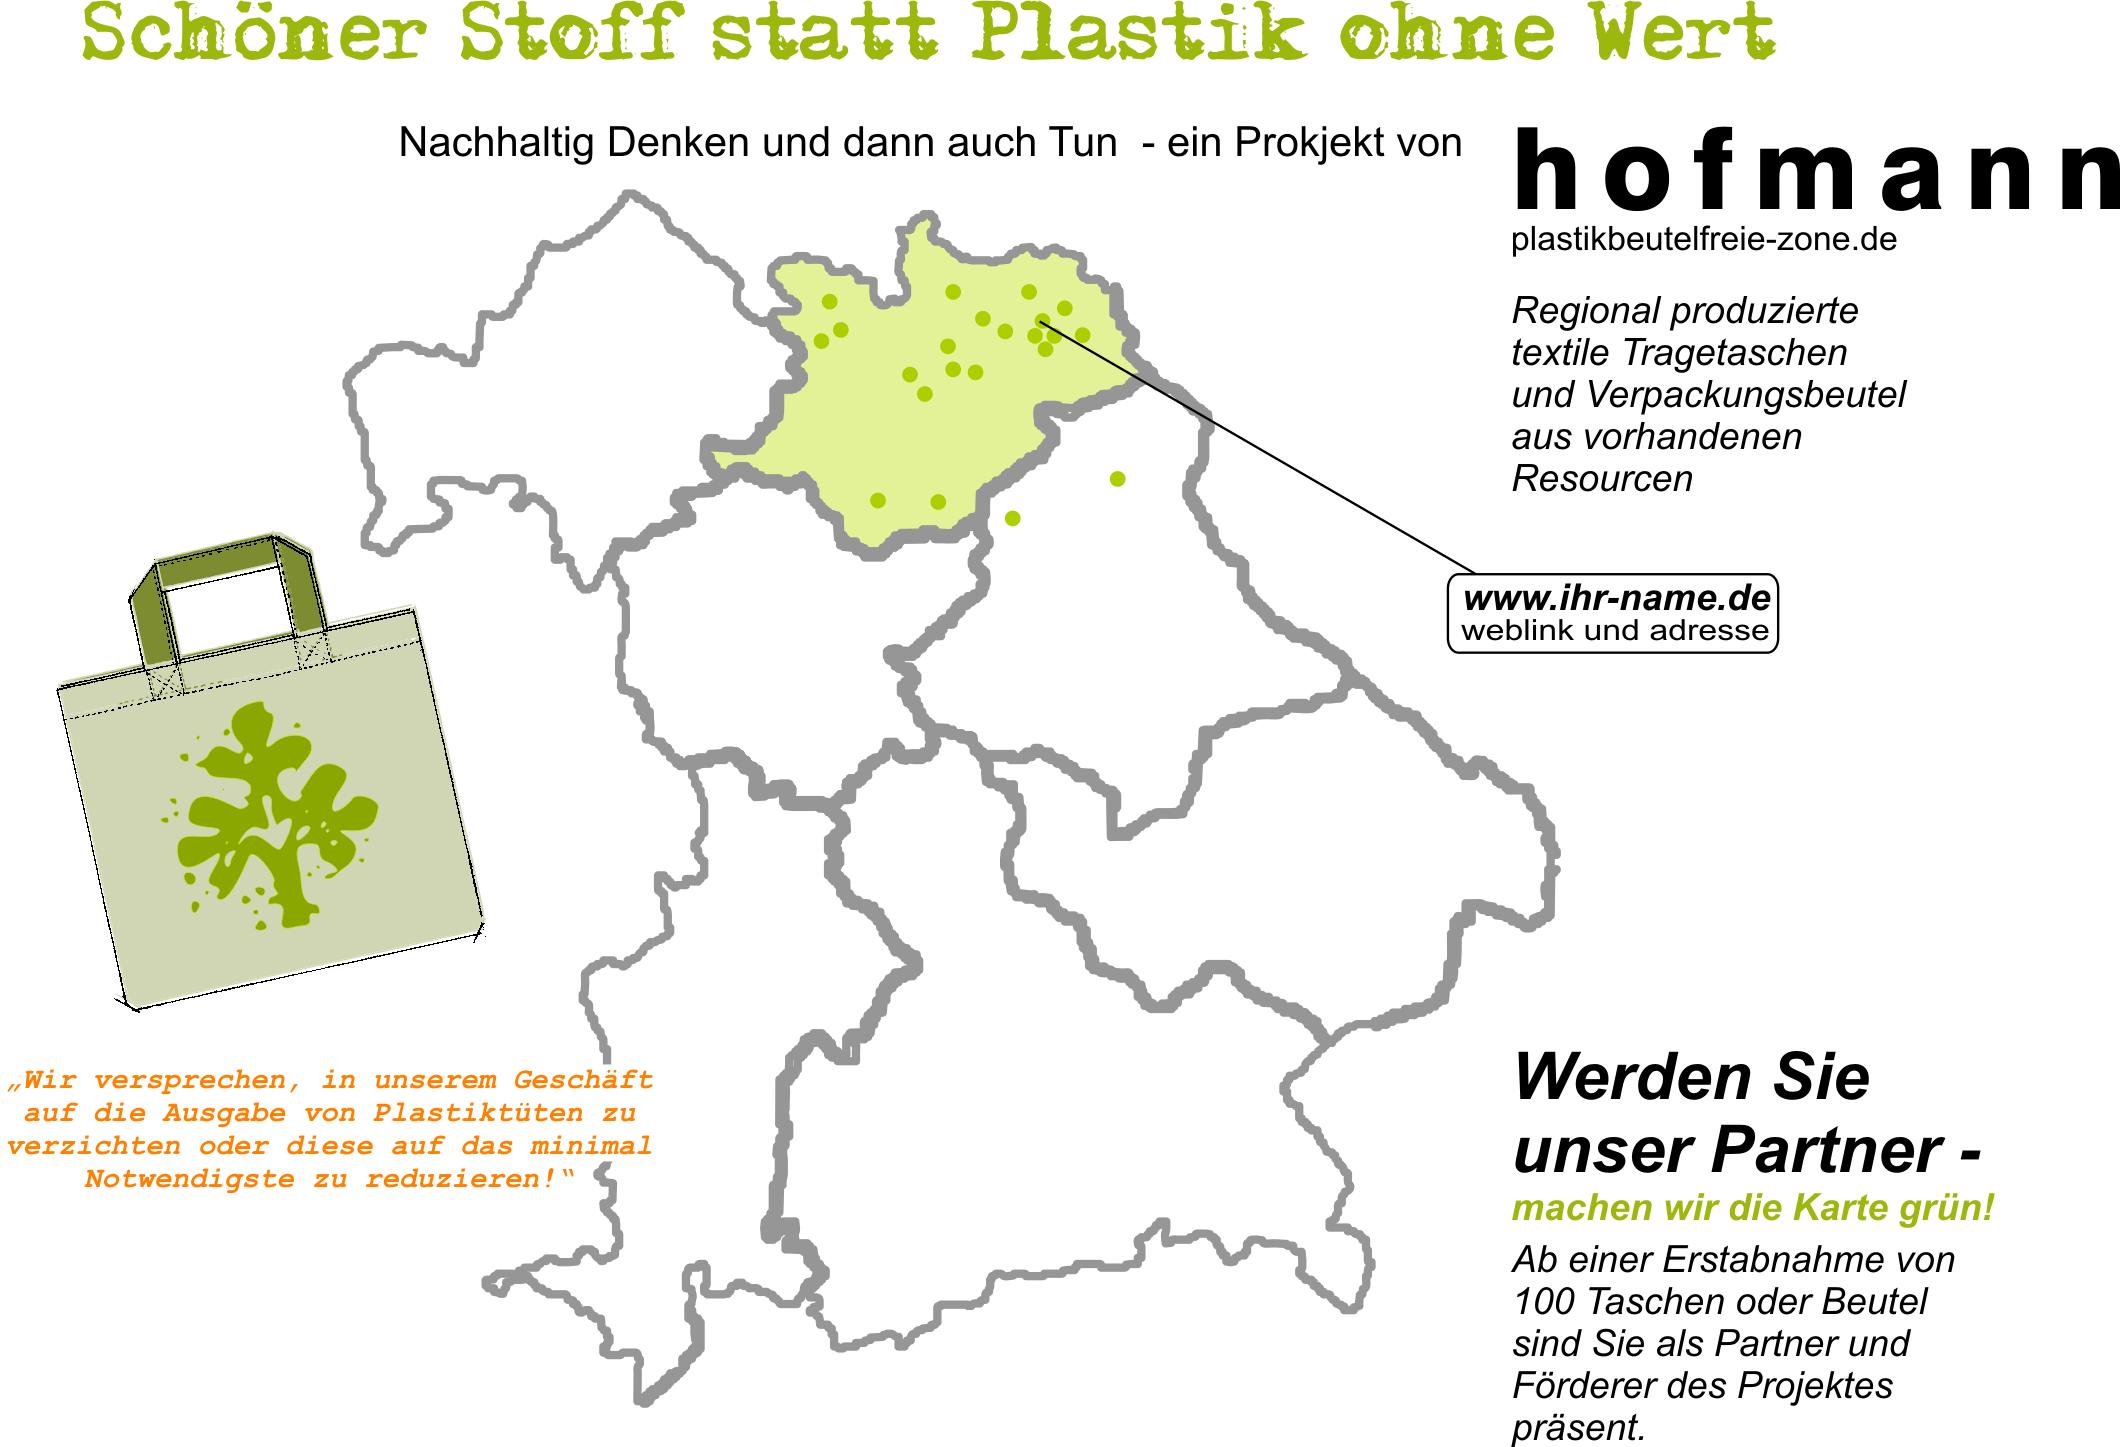 infoblatt plastikbeutelfreie zone